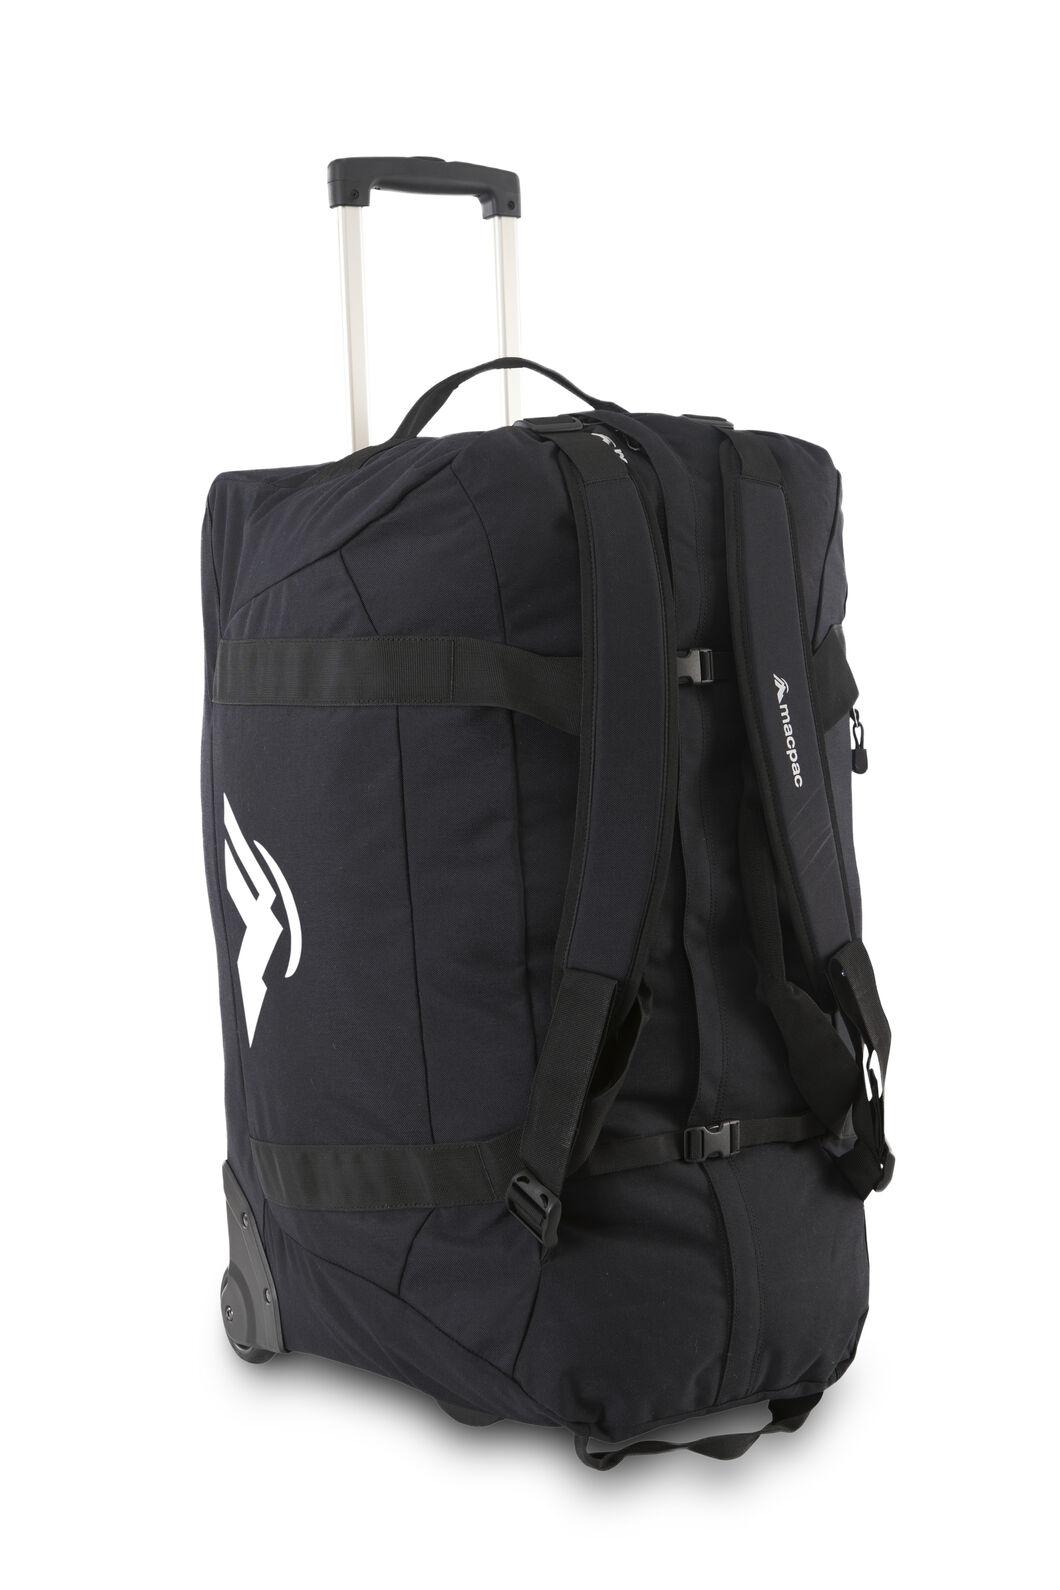 Macpac 120L Wheeled Duffel Bag, Black, hi-res